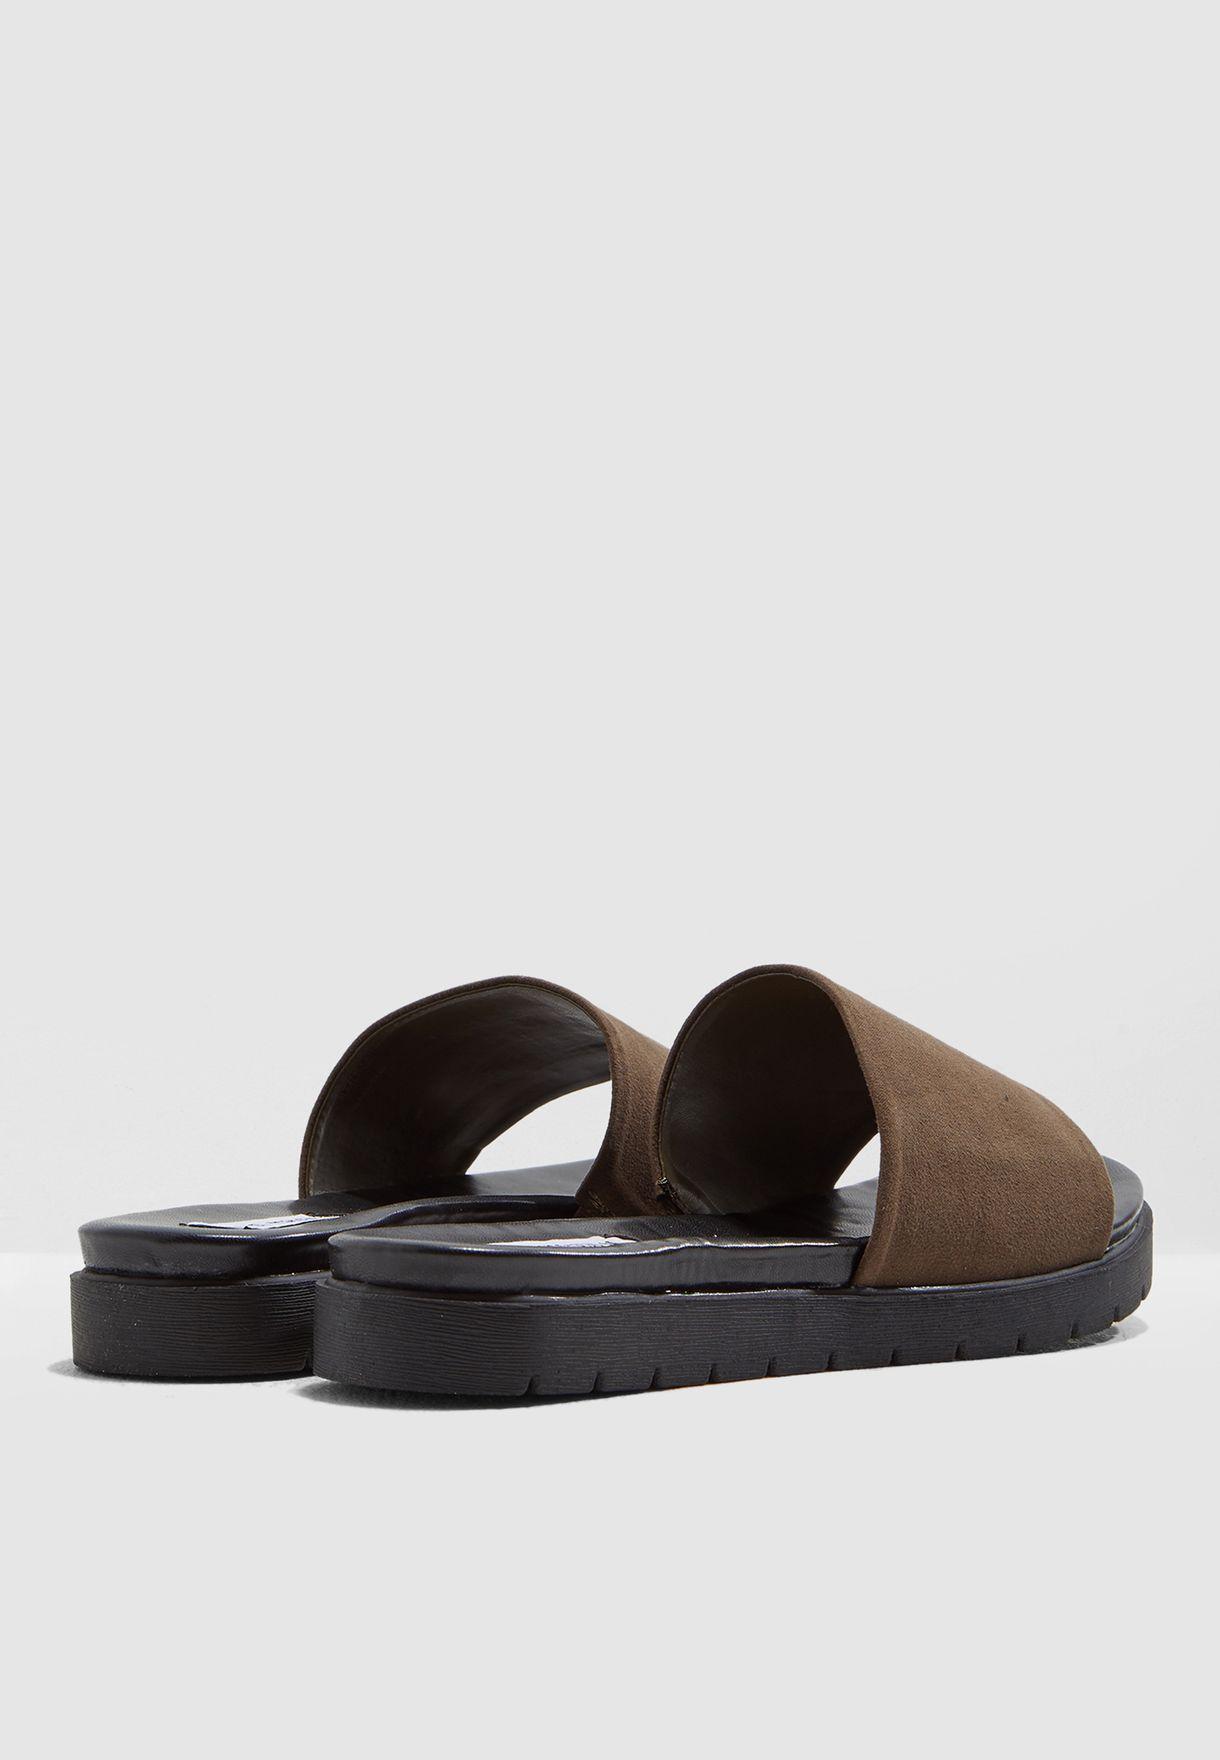 Stefanie One Strap Sandal